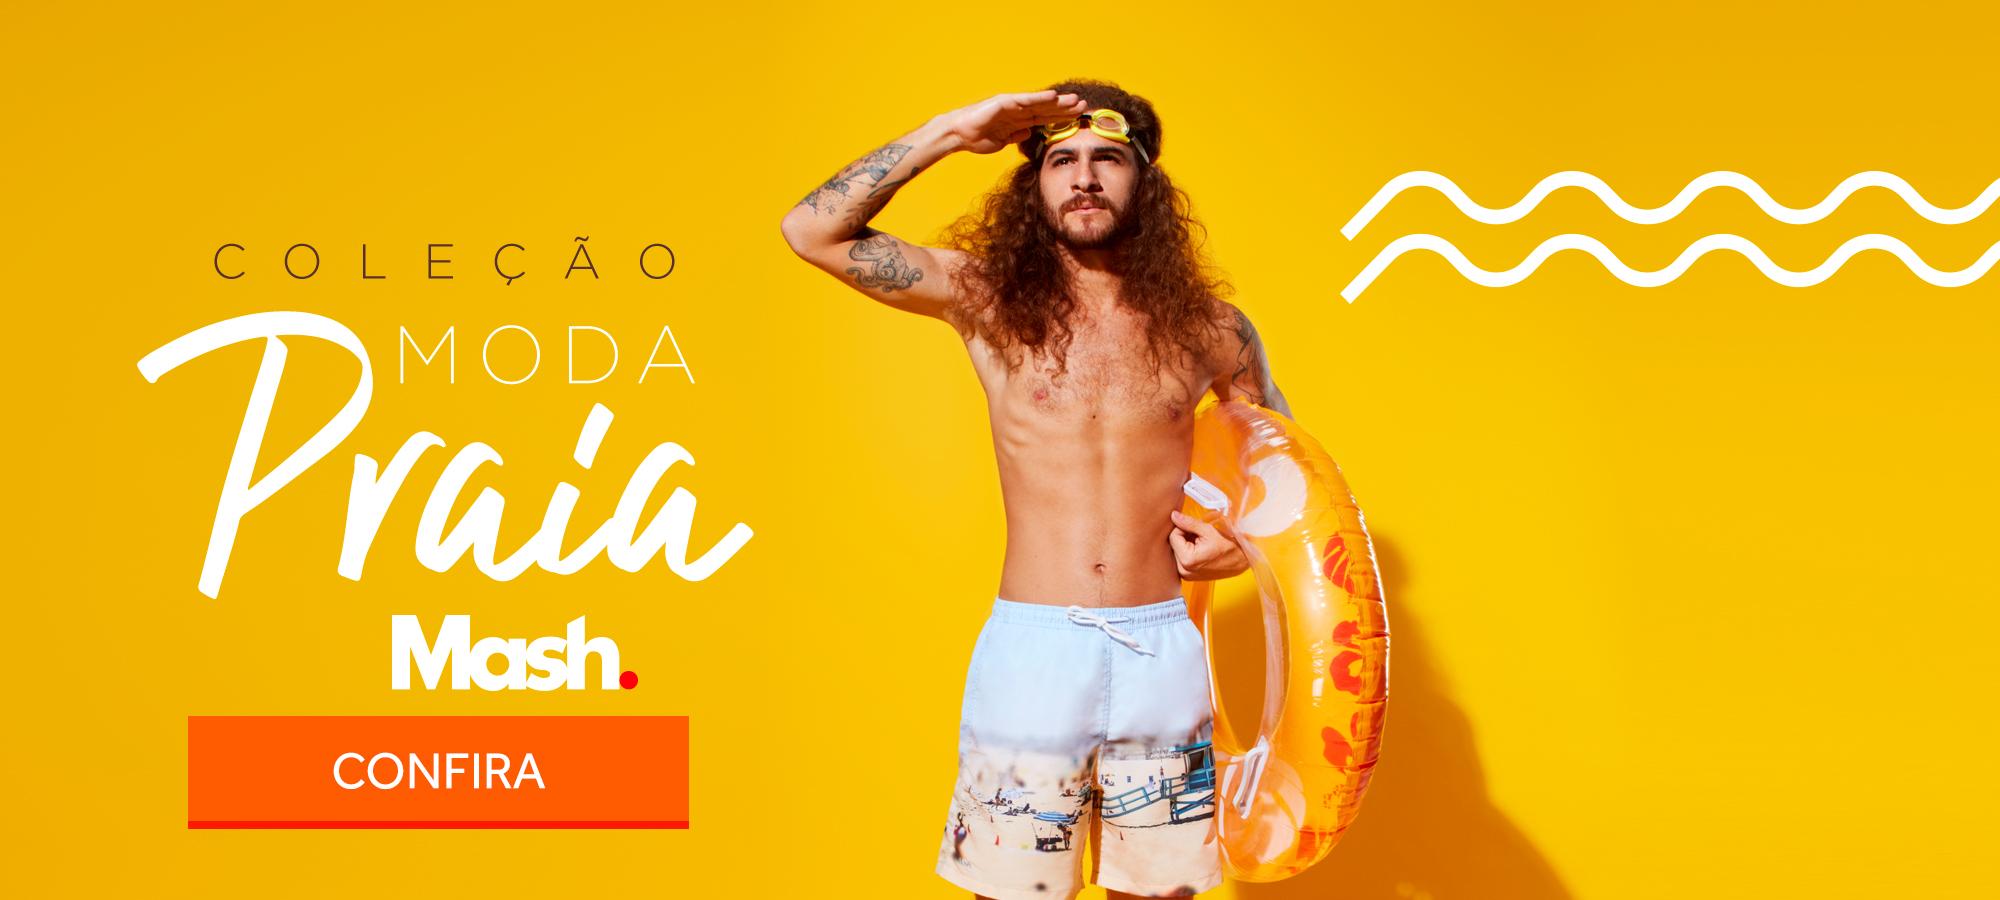 Moda praia shorts